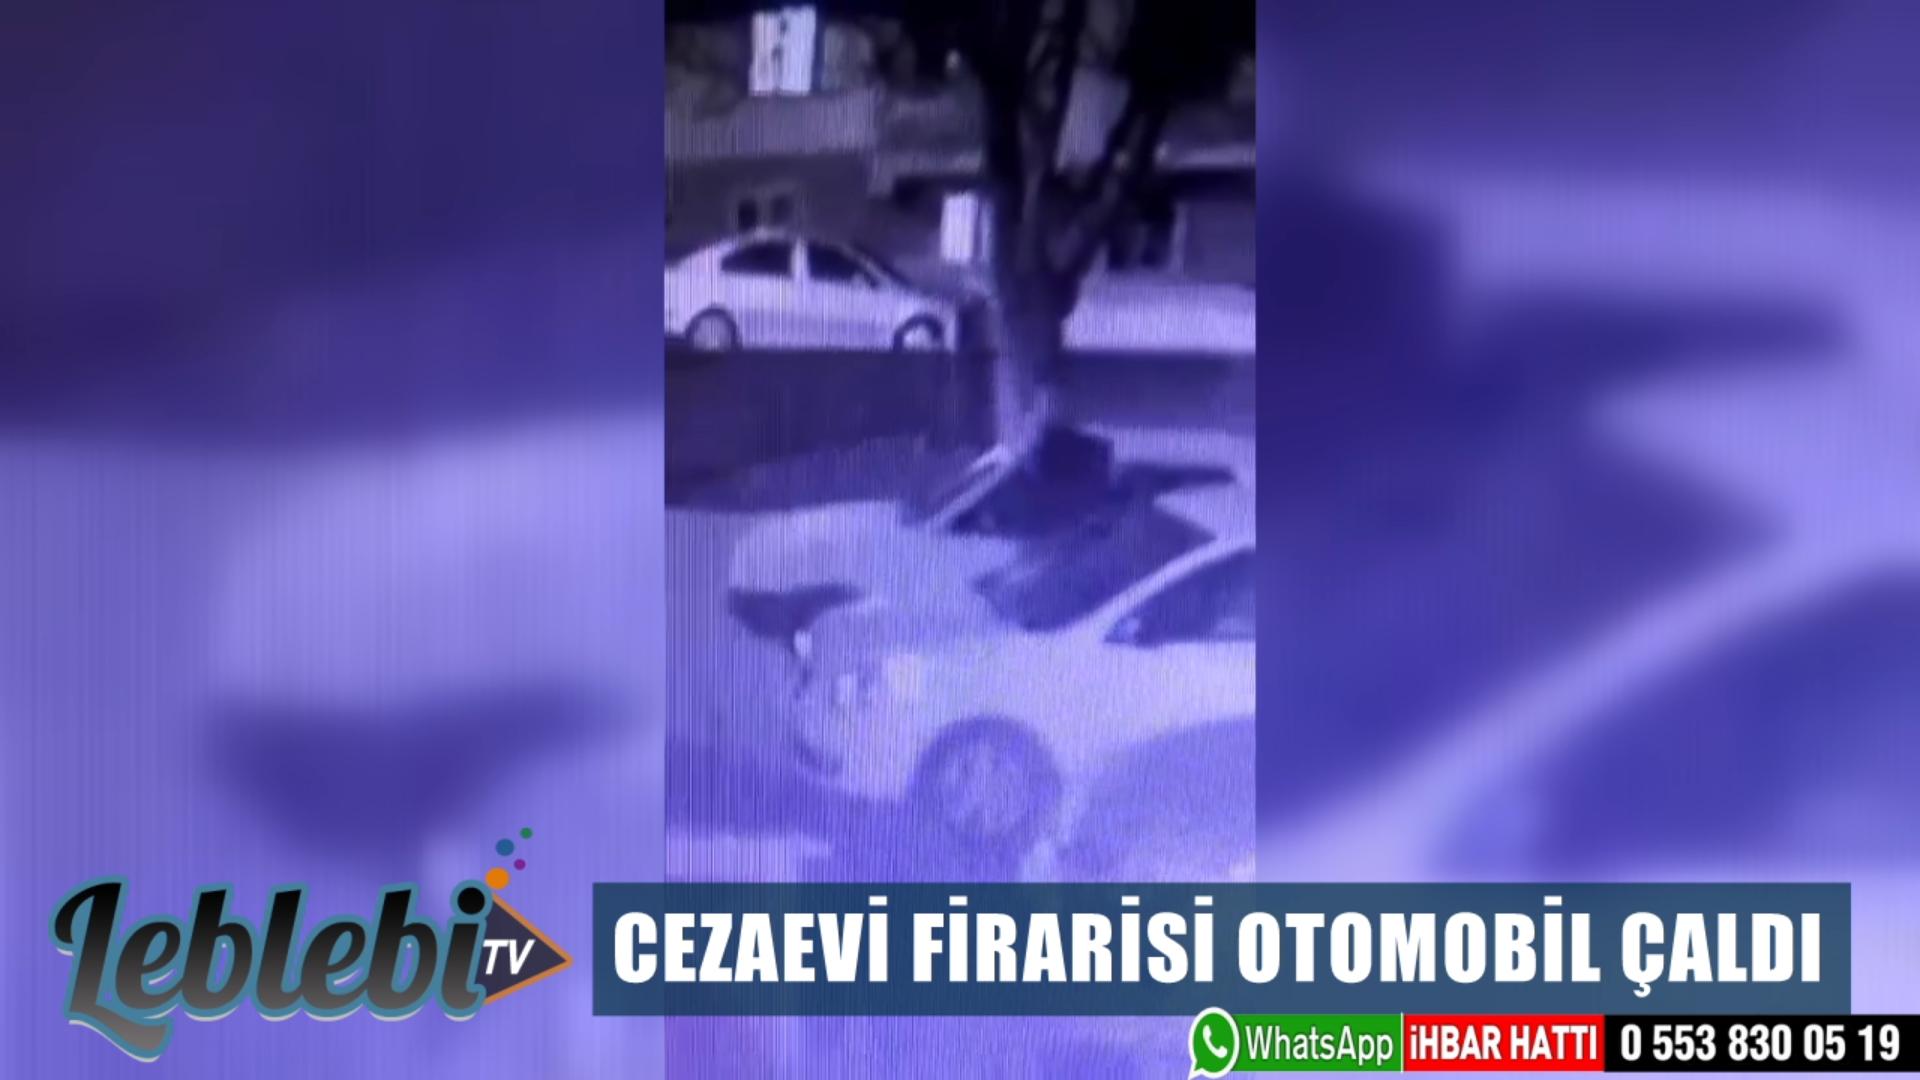 CEZAEVİ FİRARİSİ OTOMOBİL ÇALDI